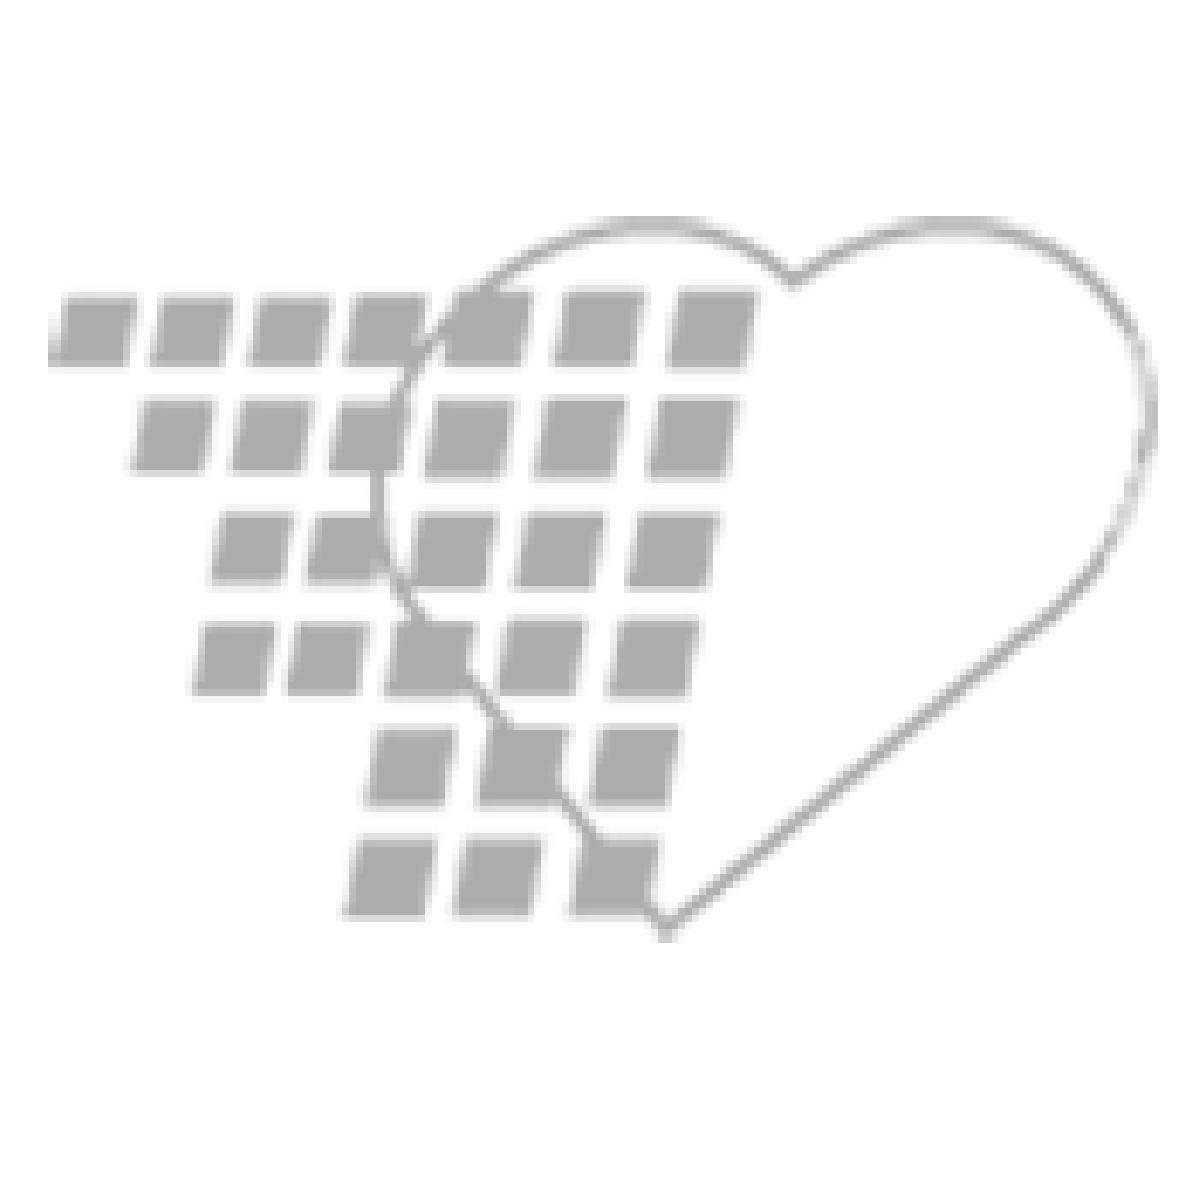 09-31-9867 Understanding Epilepsy Chart